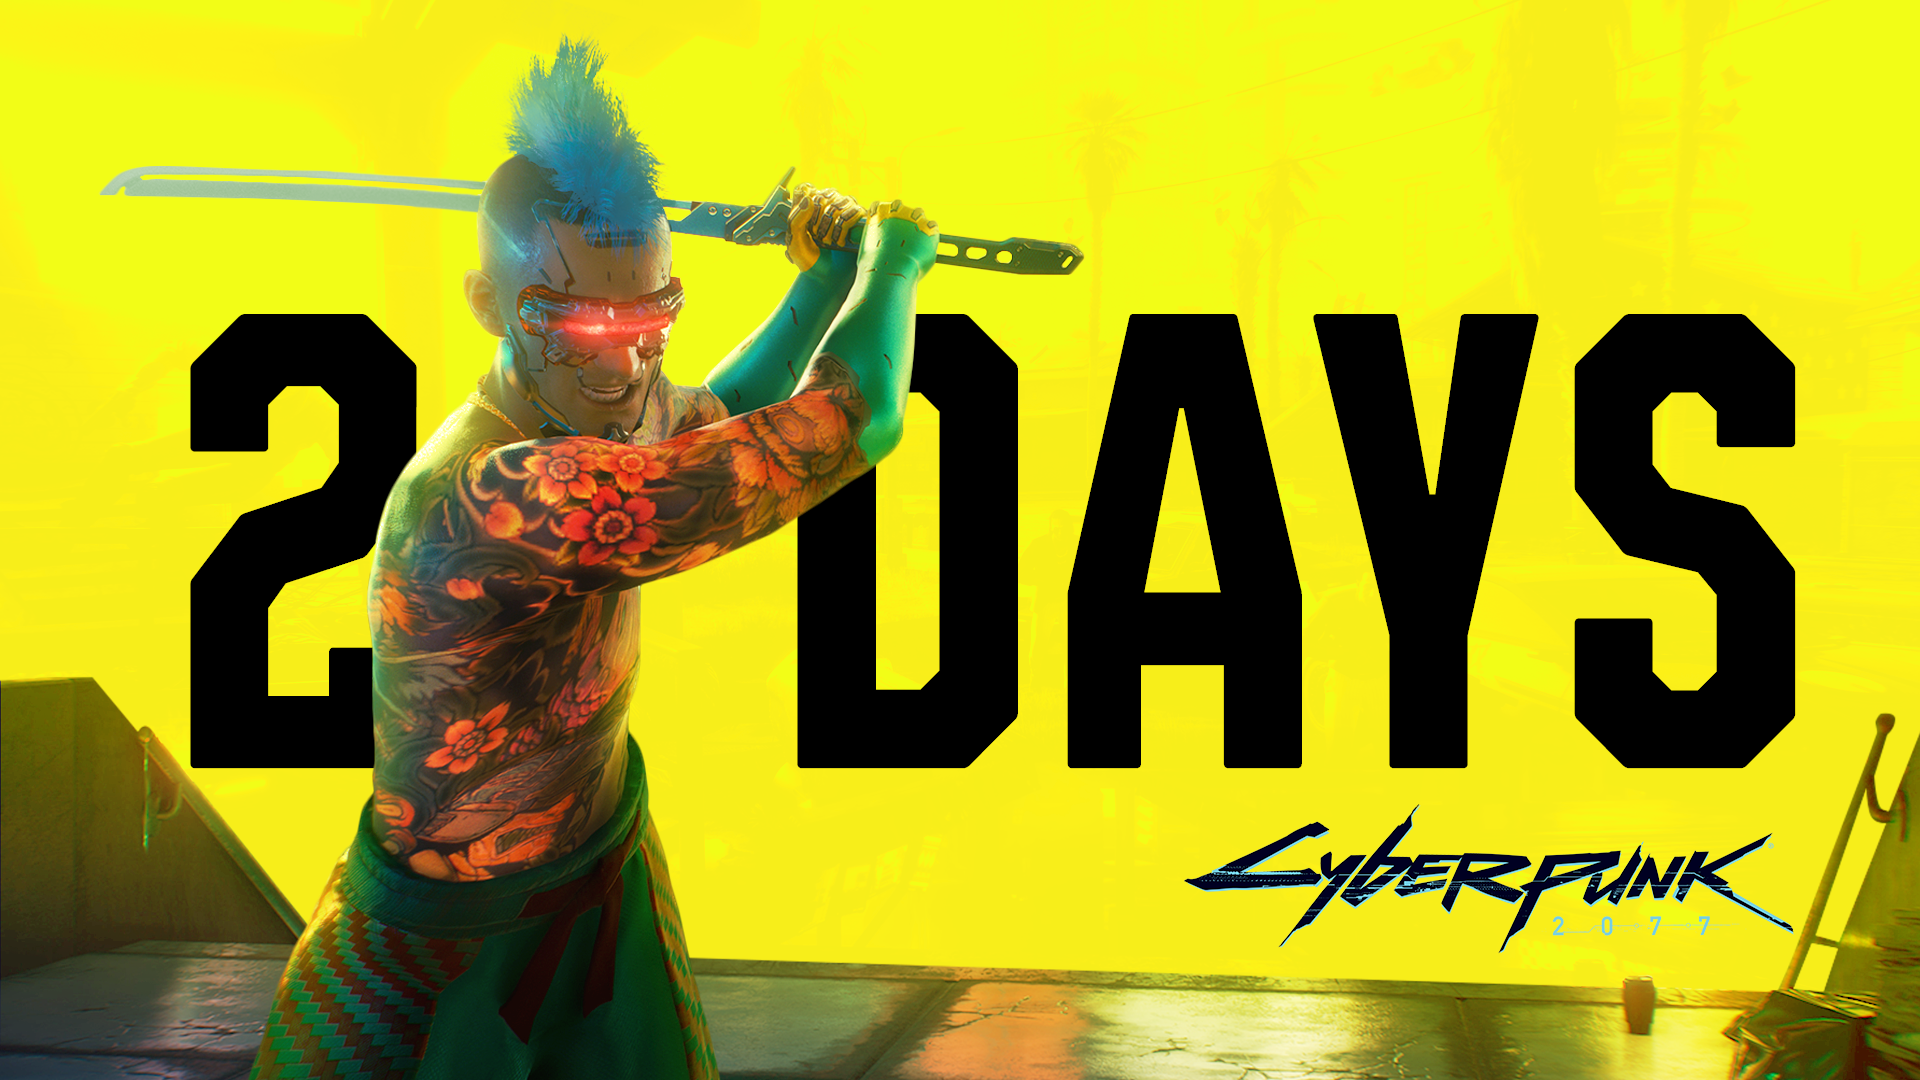 2_DAYS_16-9_EN.png